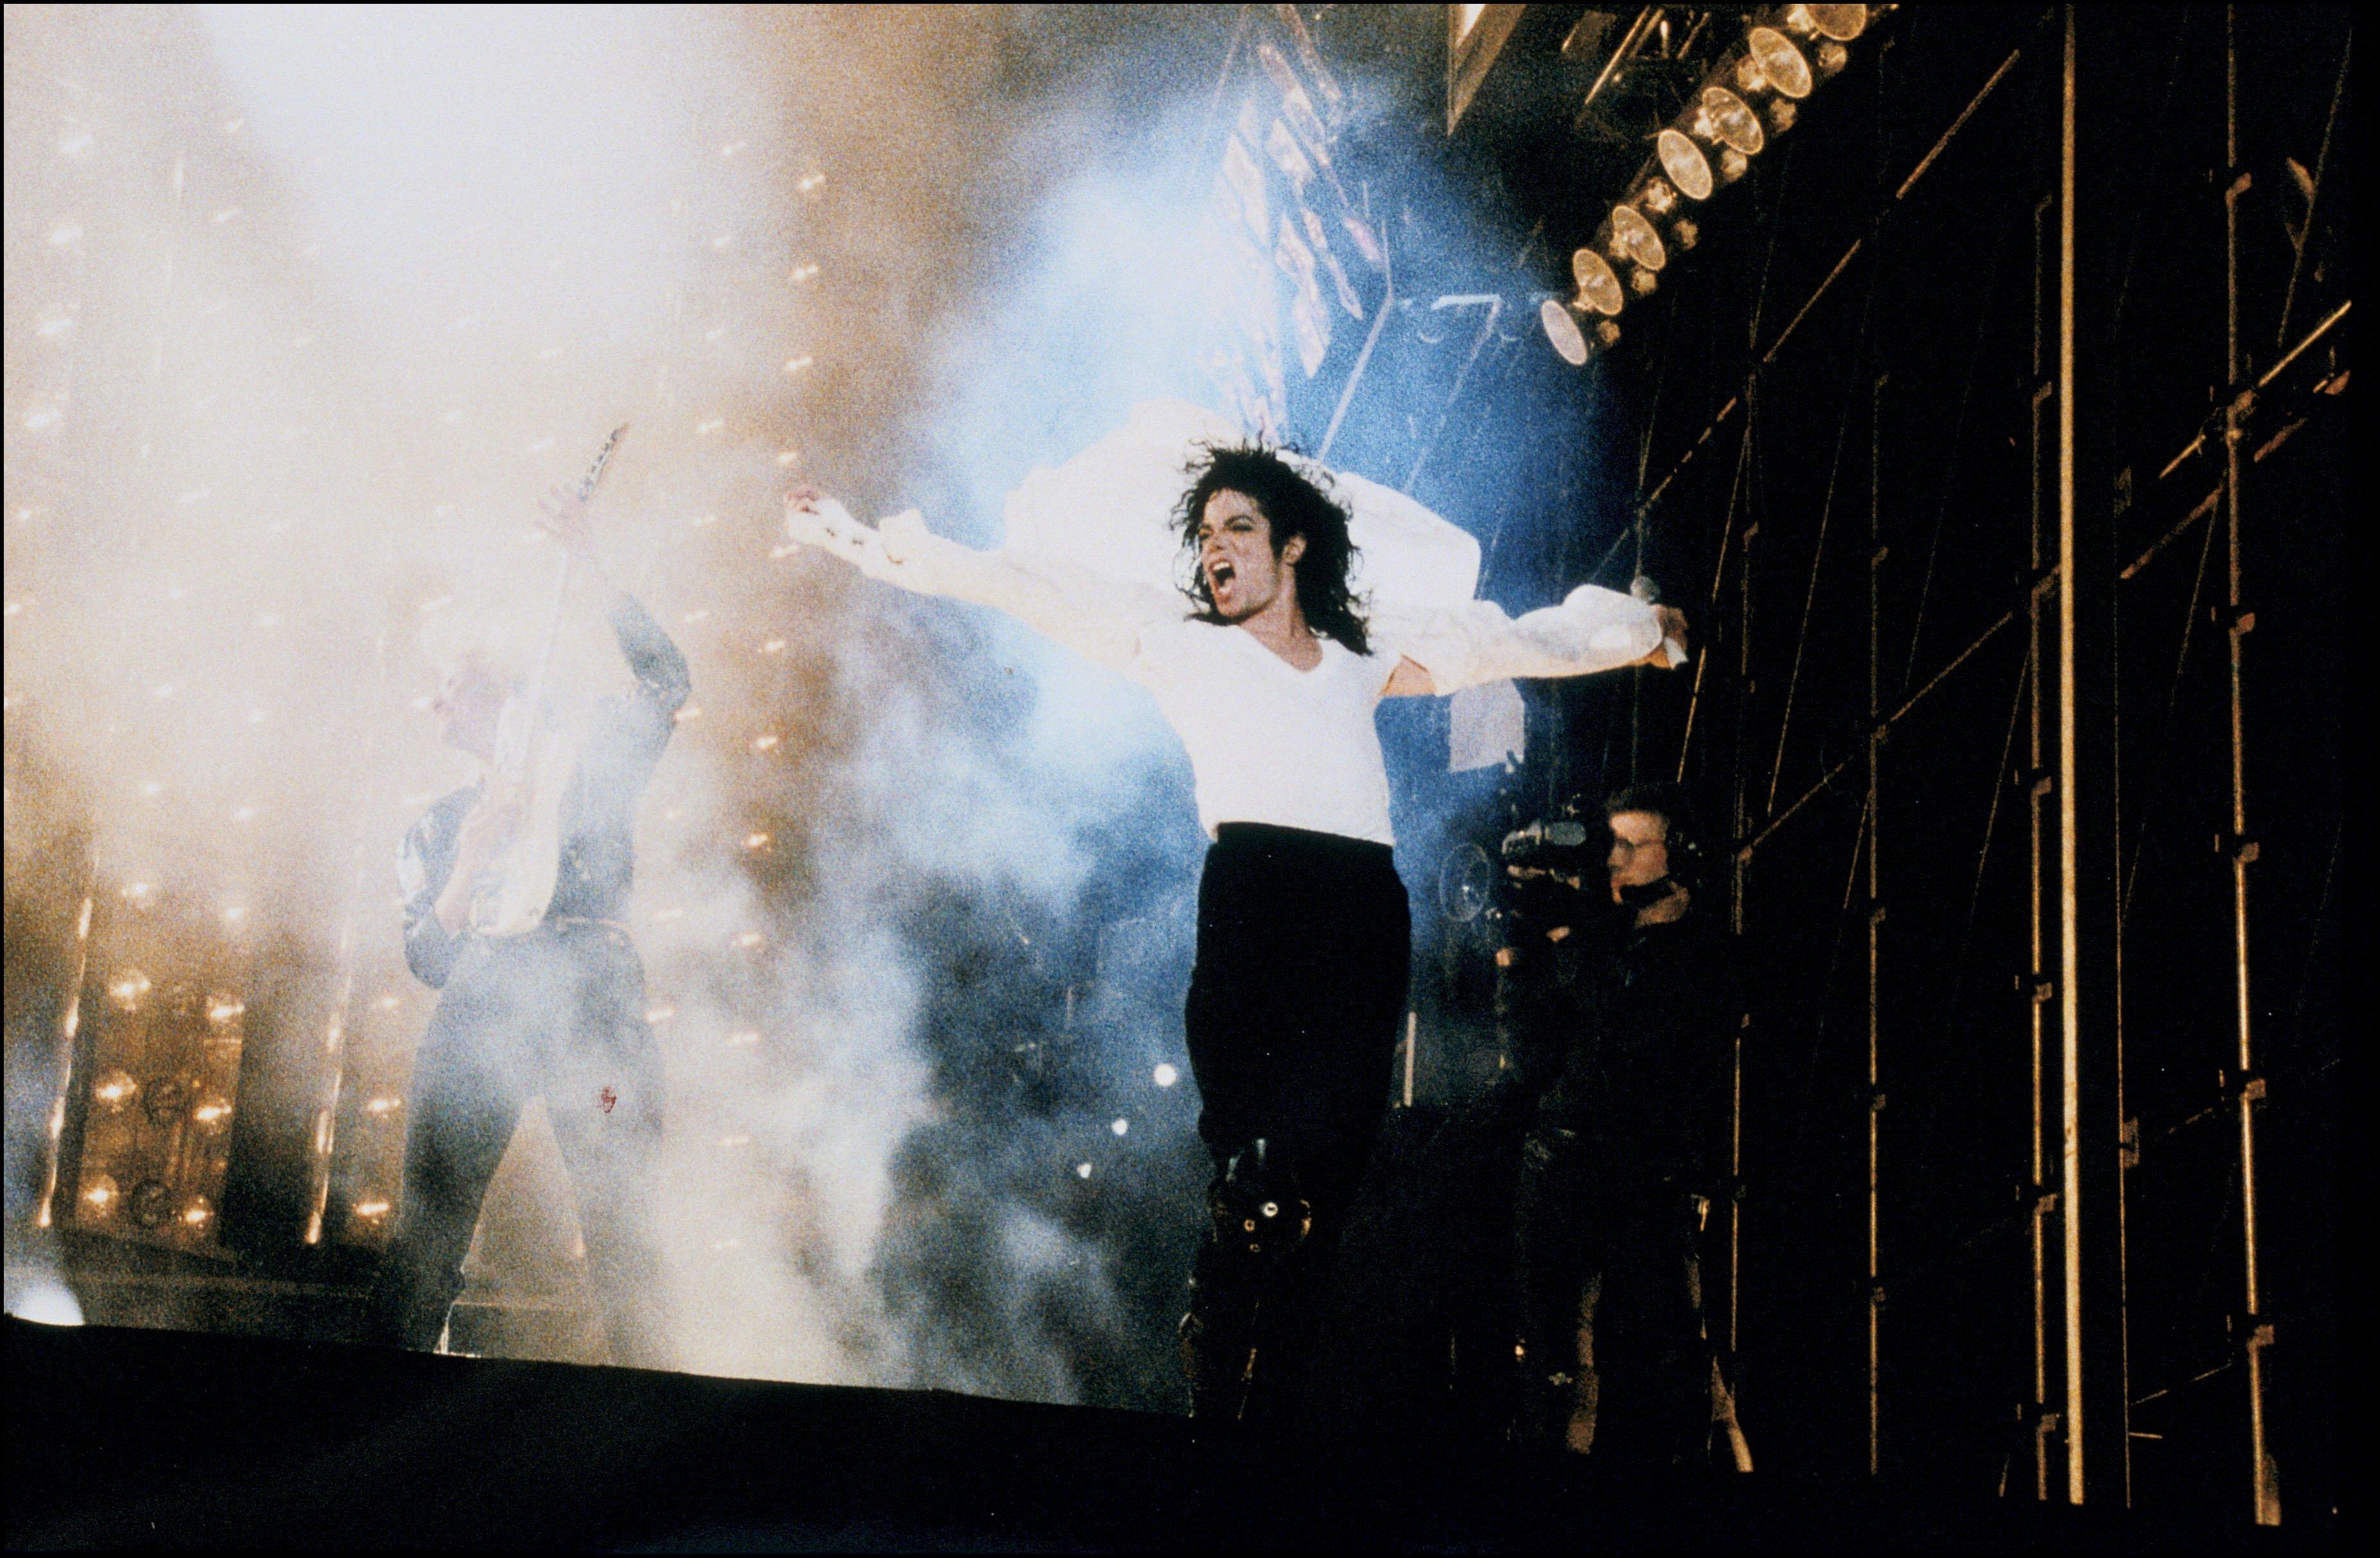 Michael Jackson Doc 'Leaving Neverland' Stuns